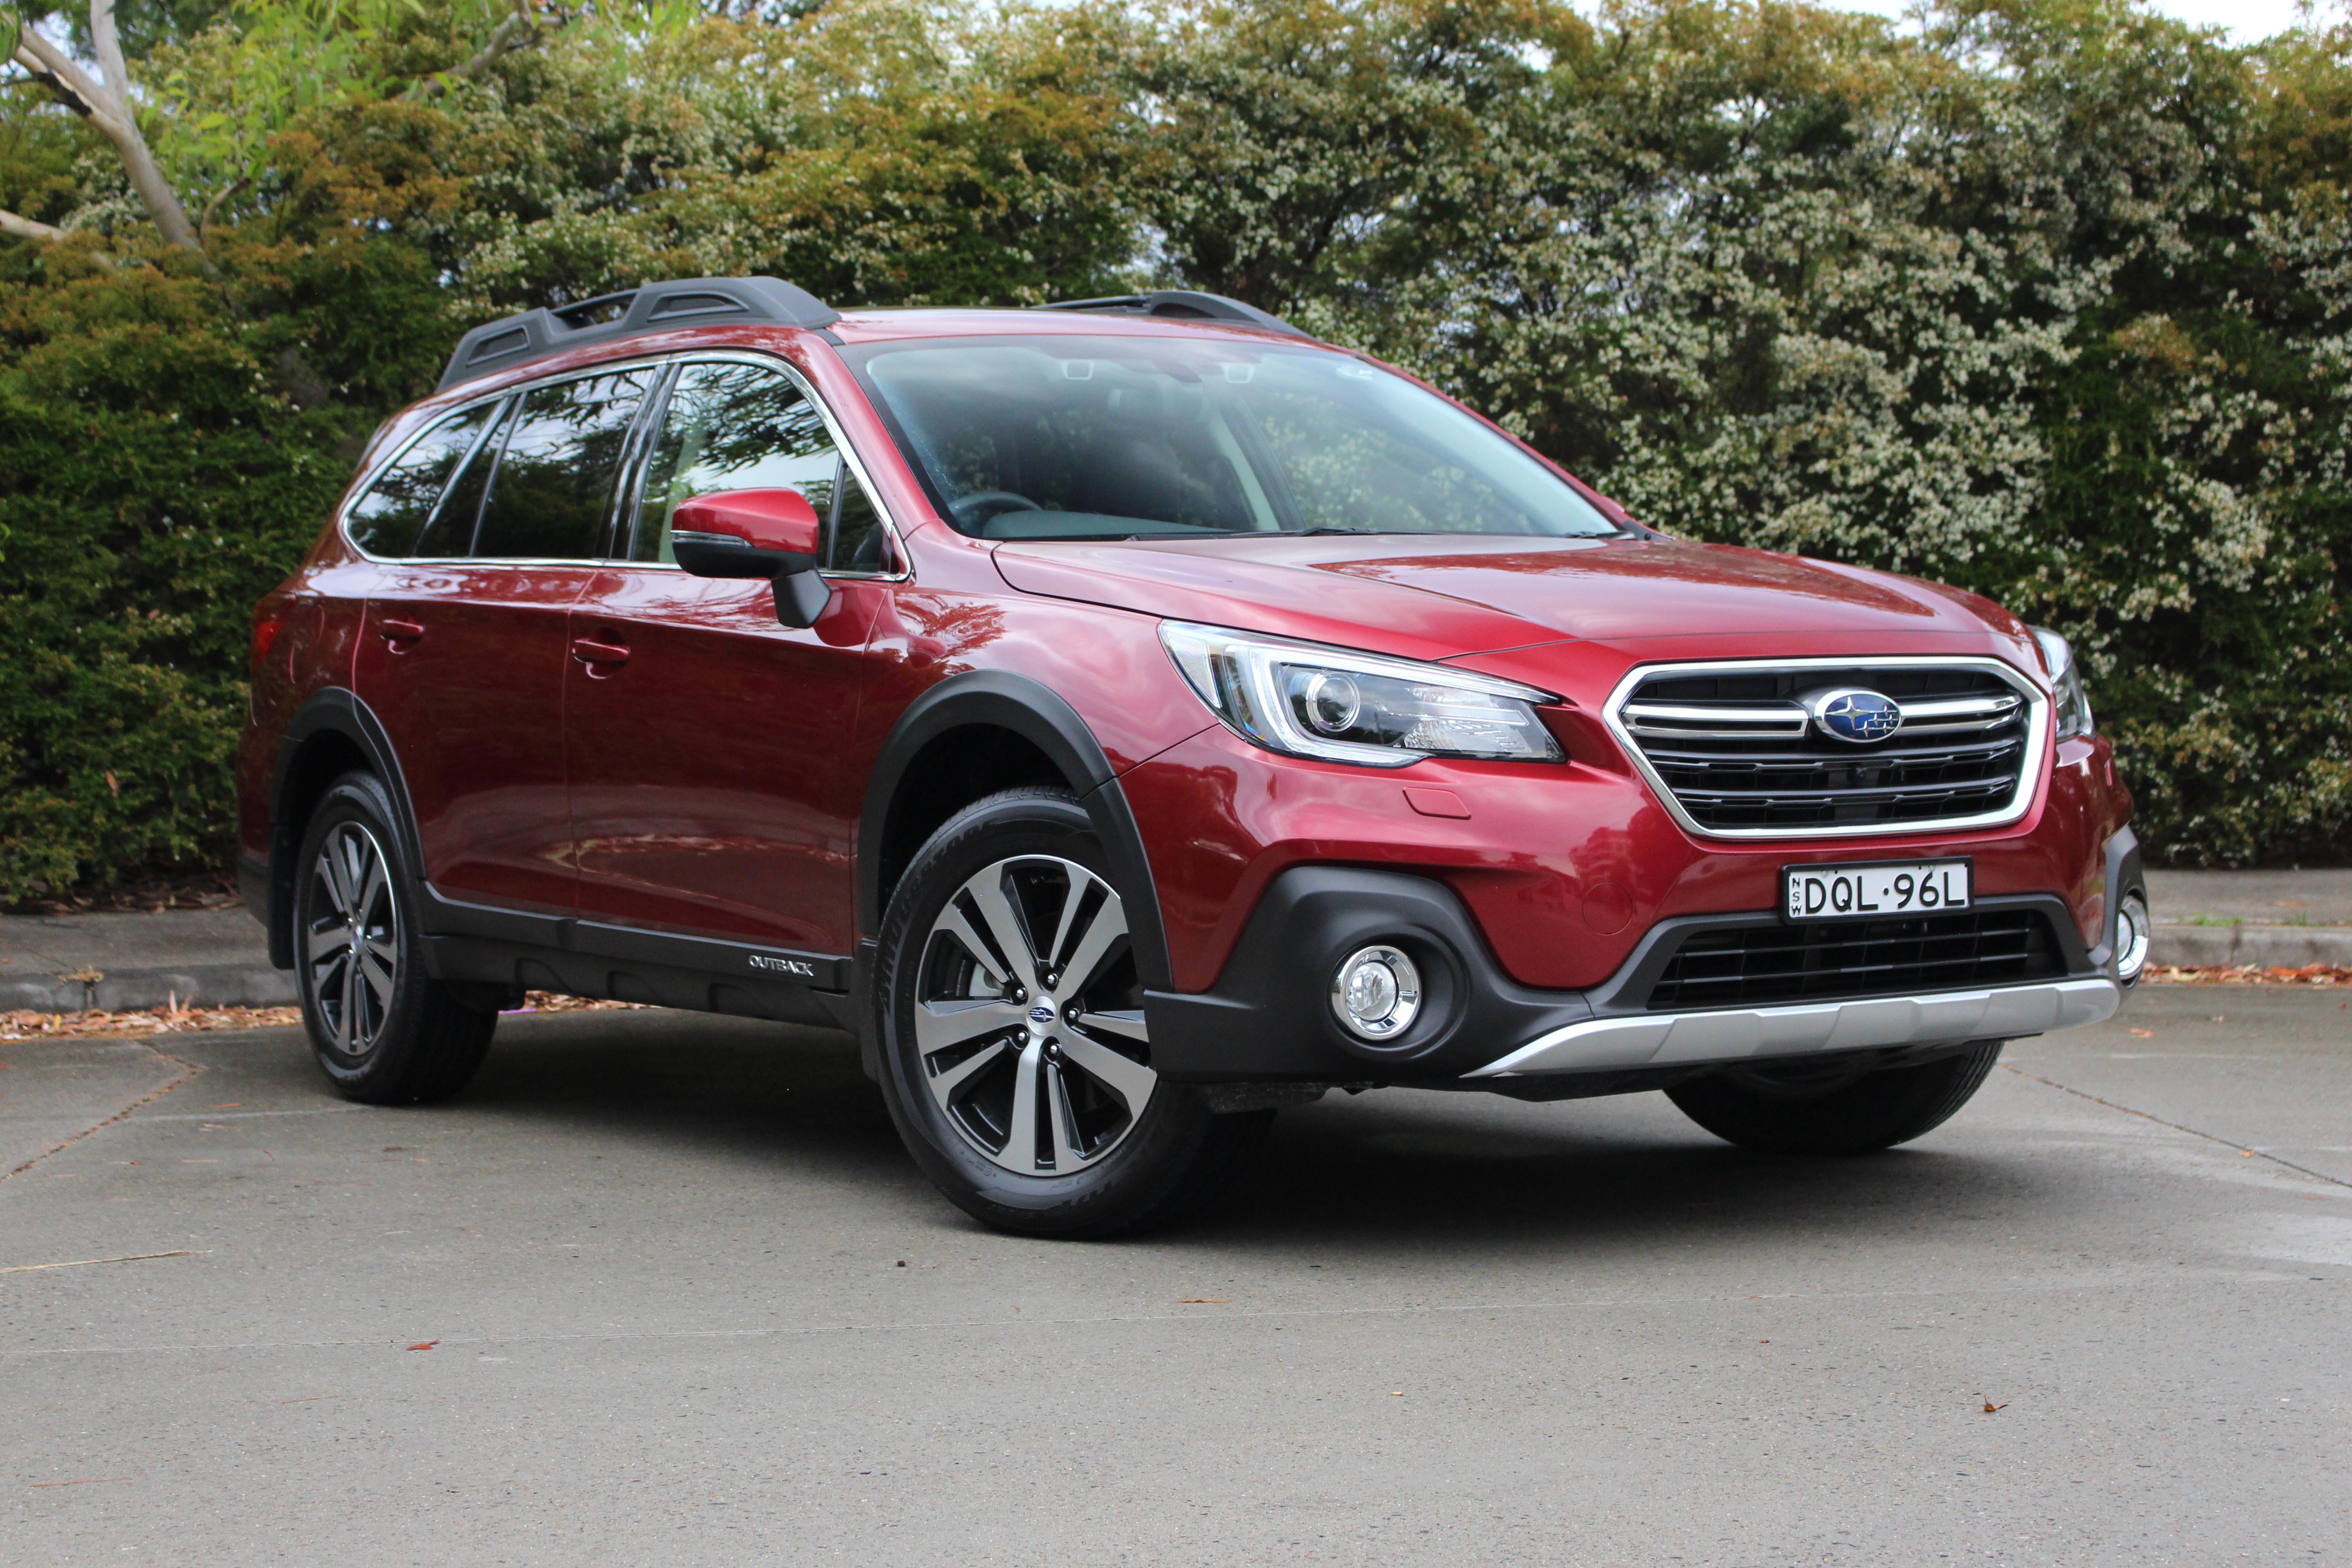 2018 Subaru Outback 2.5 Premium first drive review